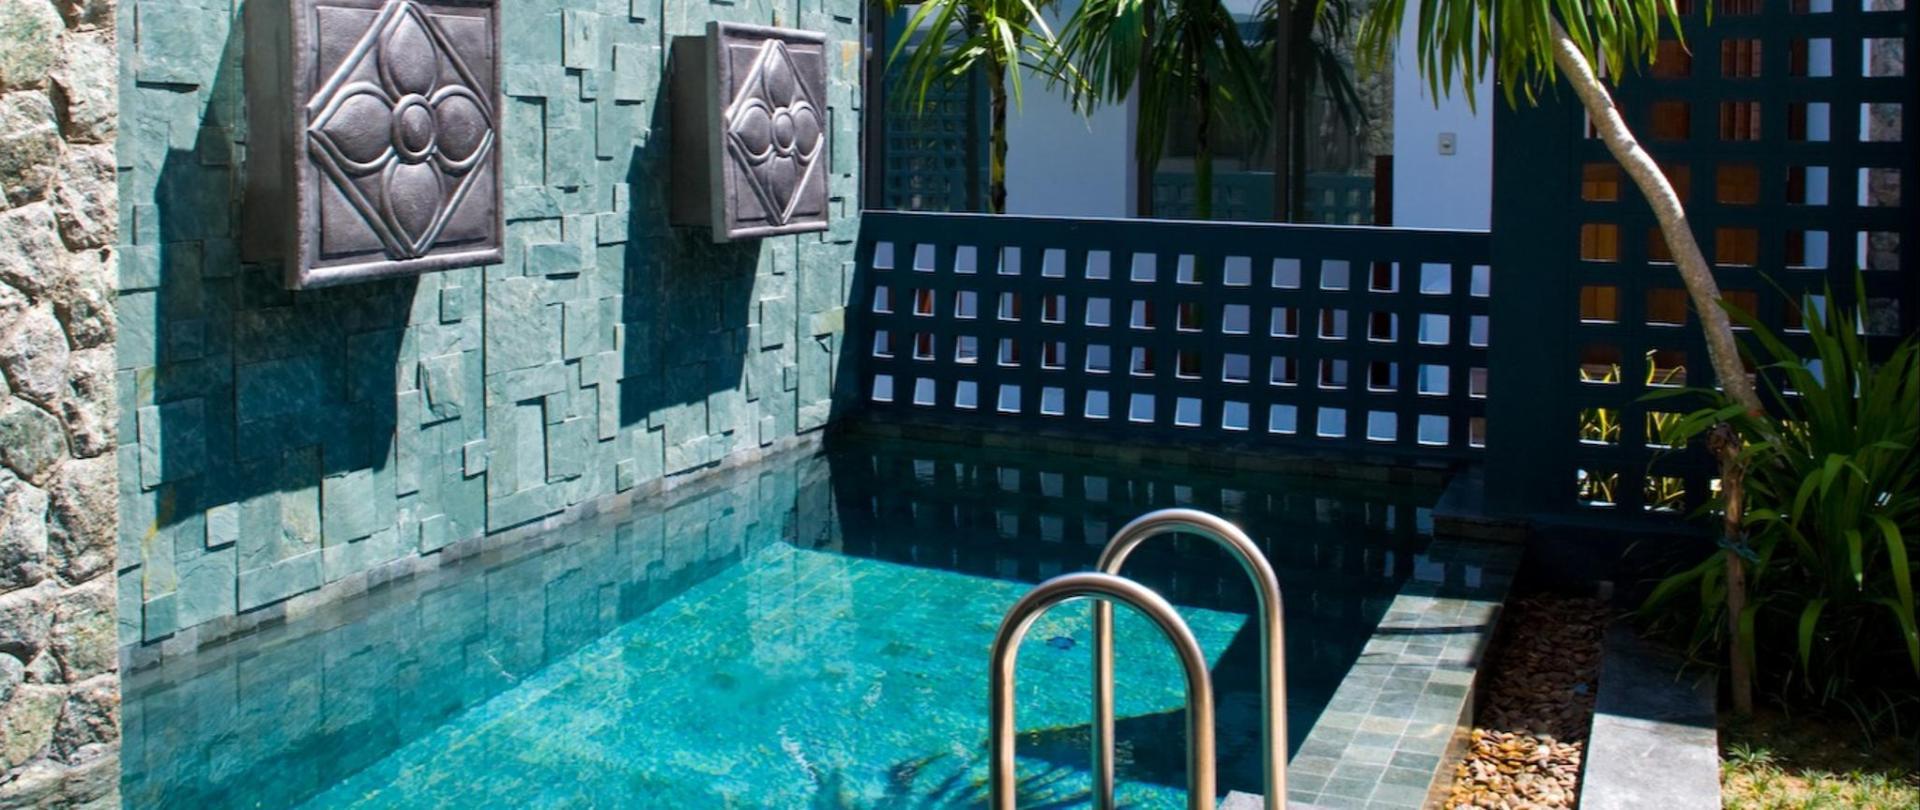 Grand_SwimmingPool.jpg